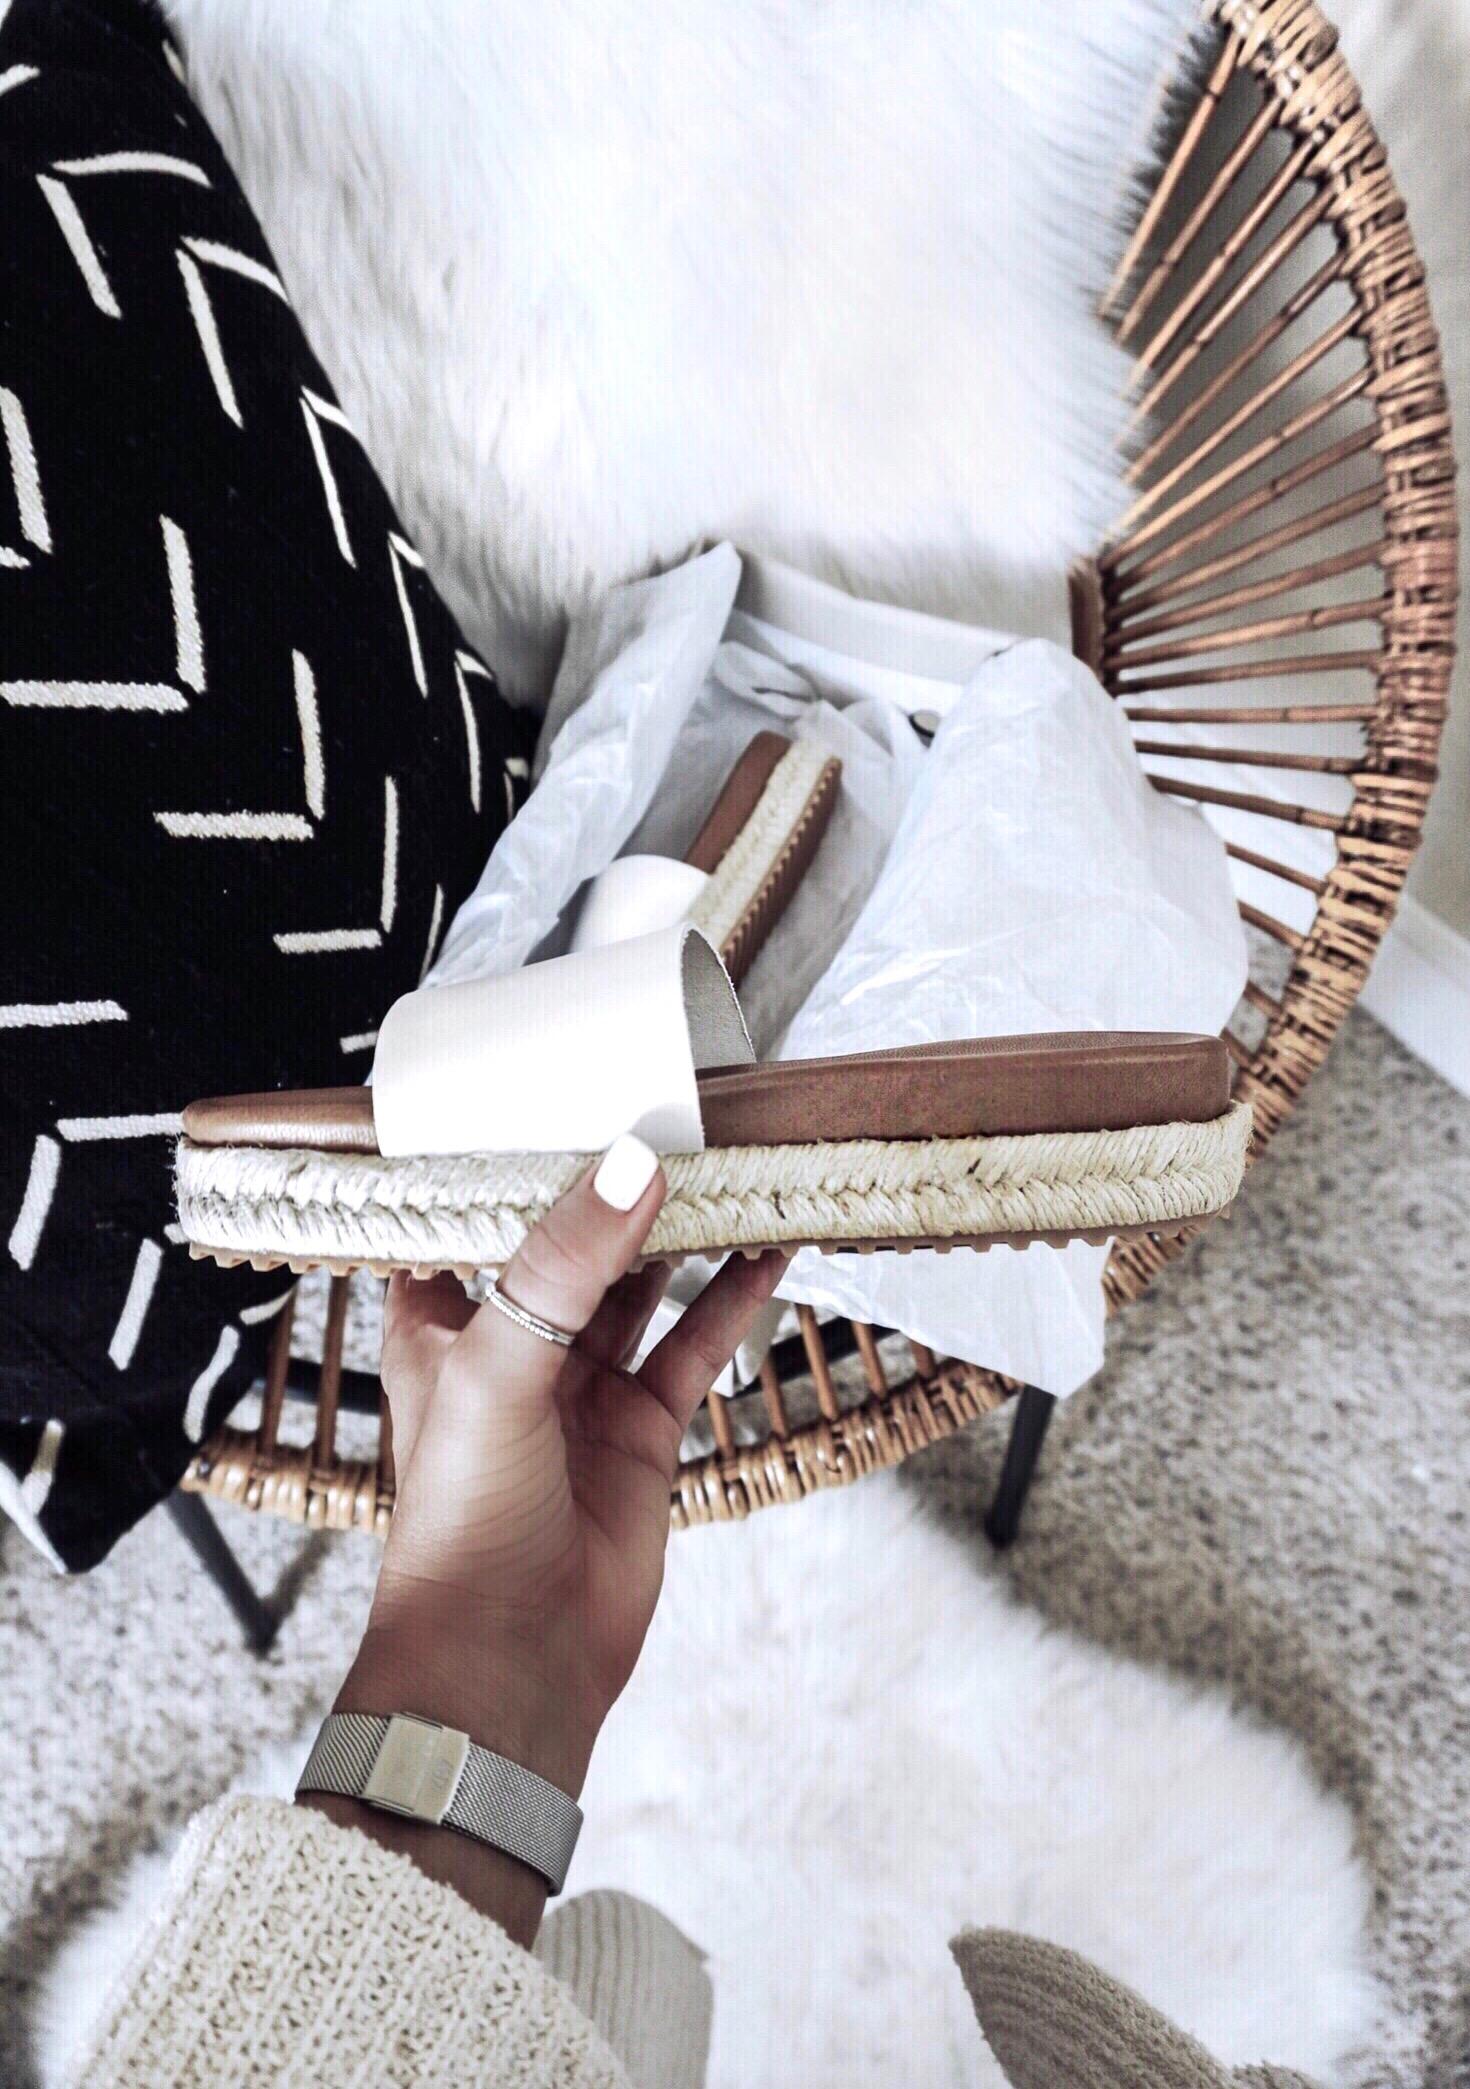 Tiffany Jais Houston fashion and lifestyle blogger of Flaunt and Center | Houston fashion blogger | white slides | 2017 summer fashion trends